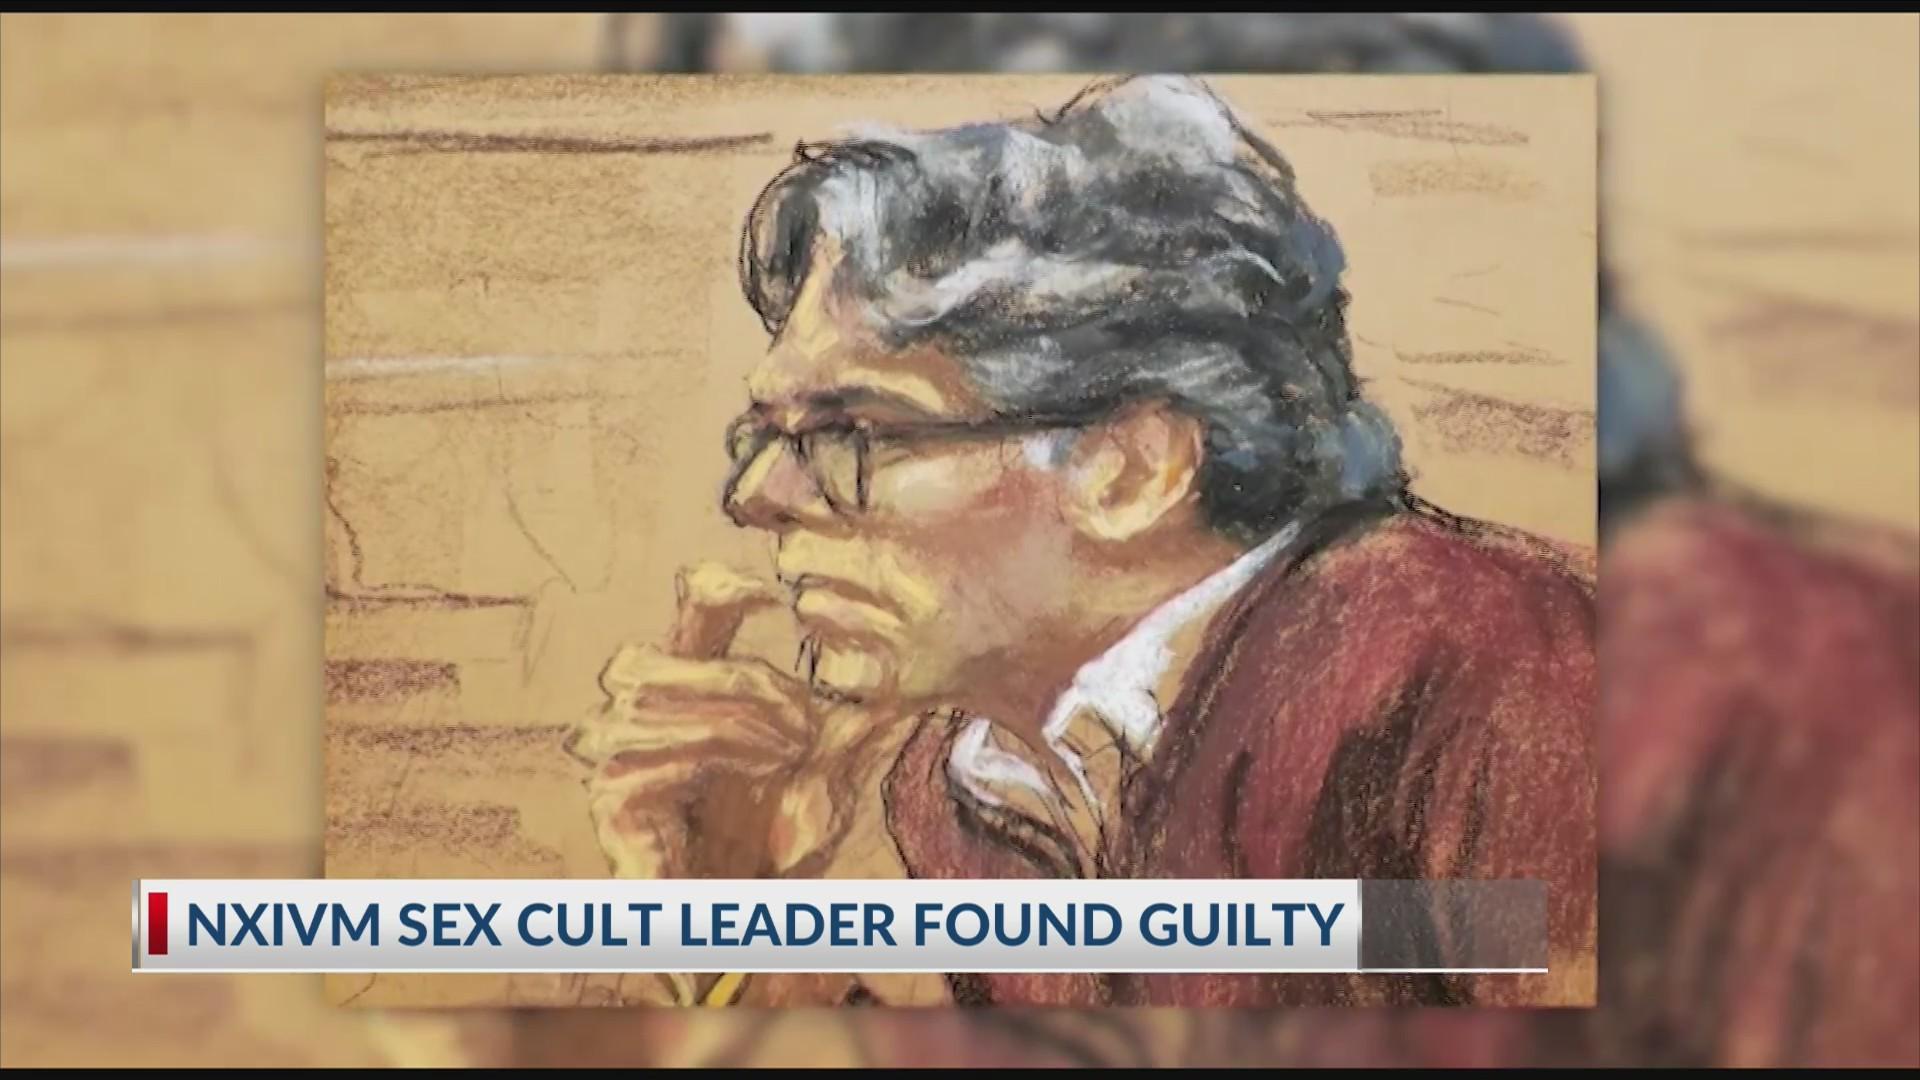 NXIVM sex cult leader guilty